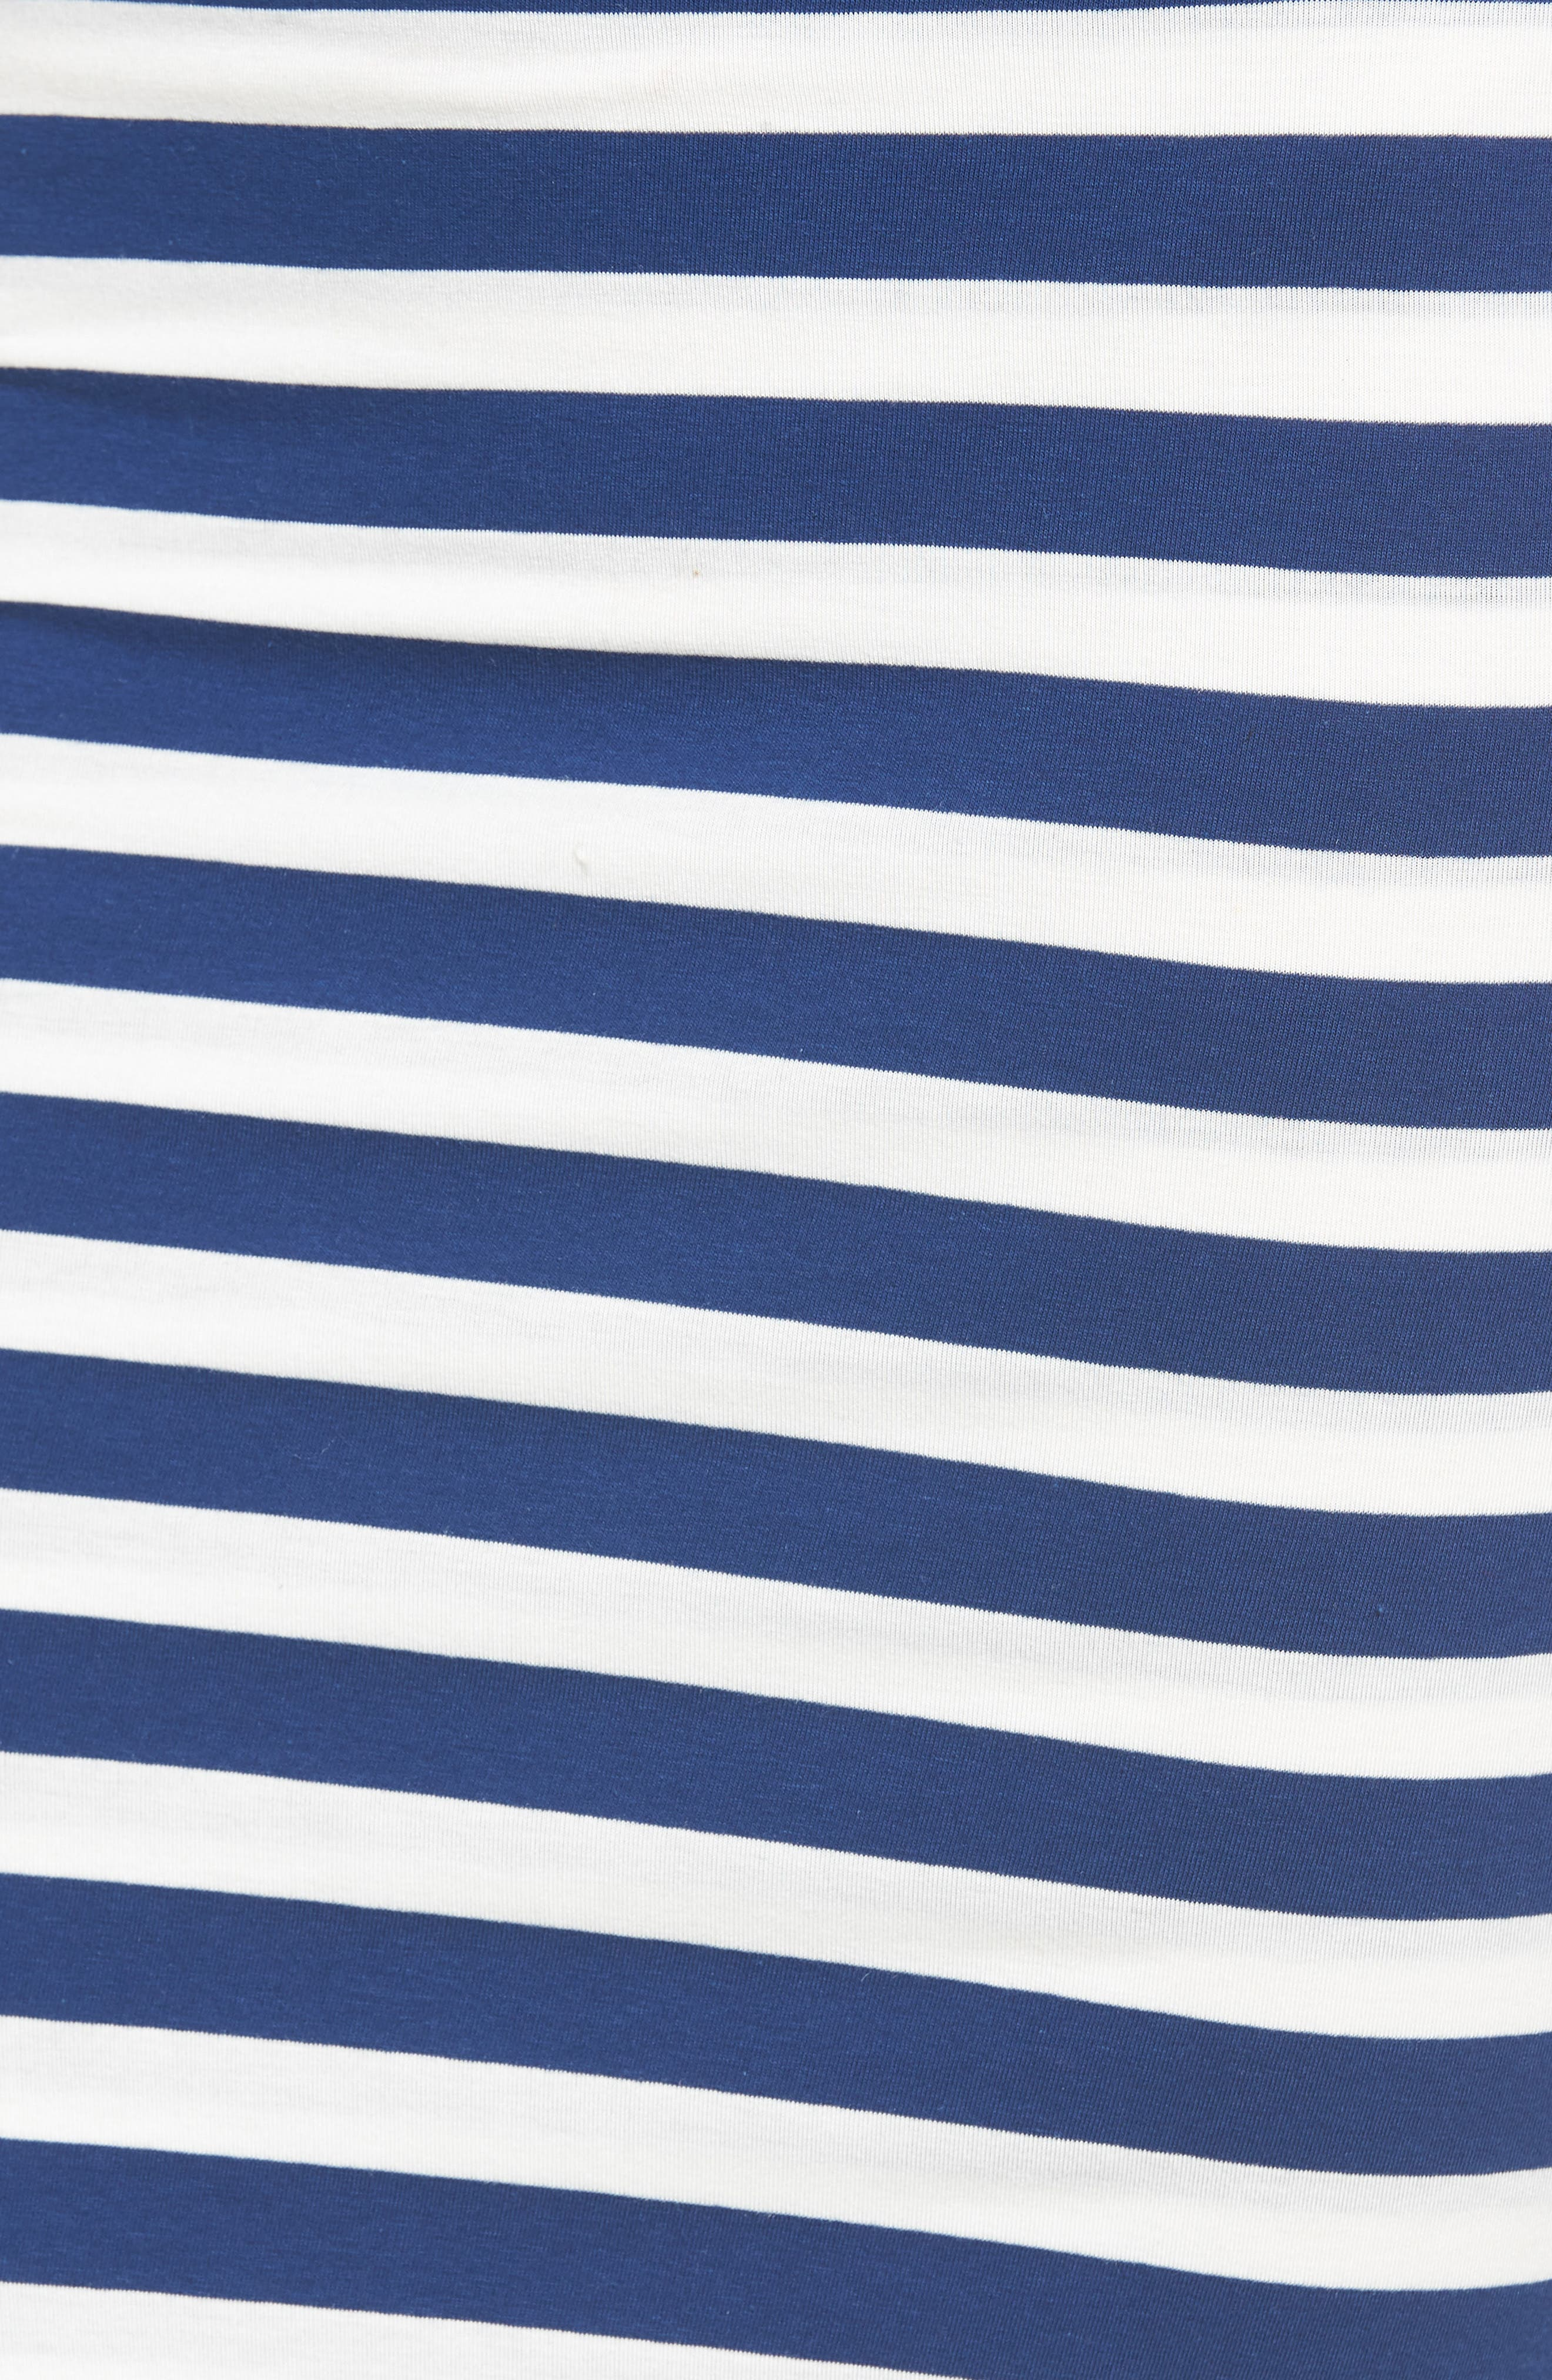 x Hi Sugarplum! Fornillo Pencil Skirt,                             Alternate thumbnail 6, color,                             Blue Stripe